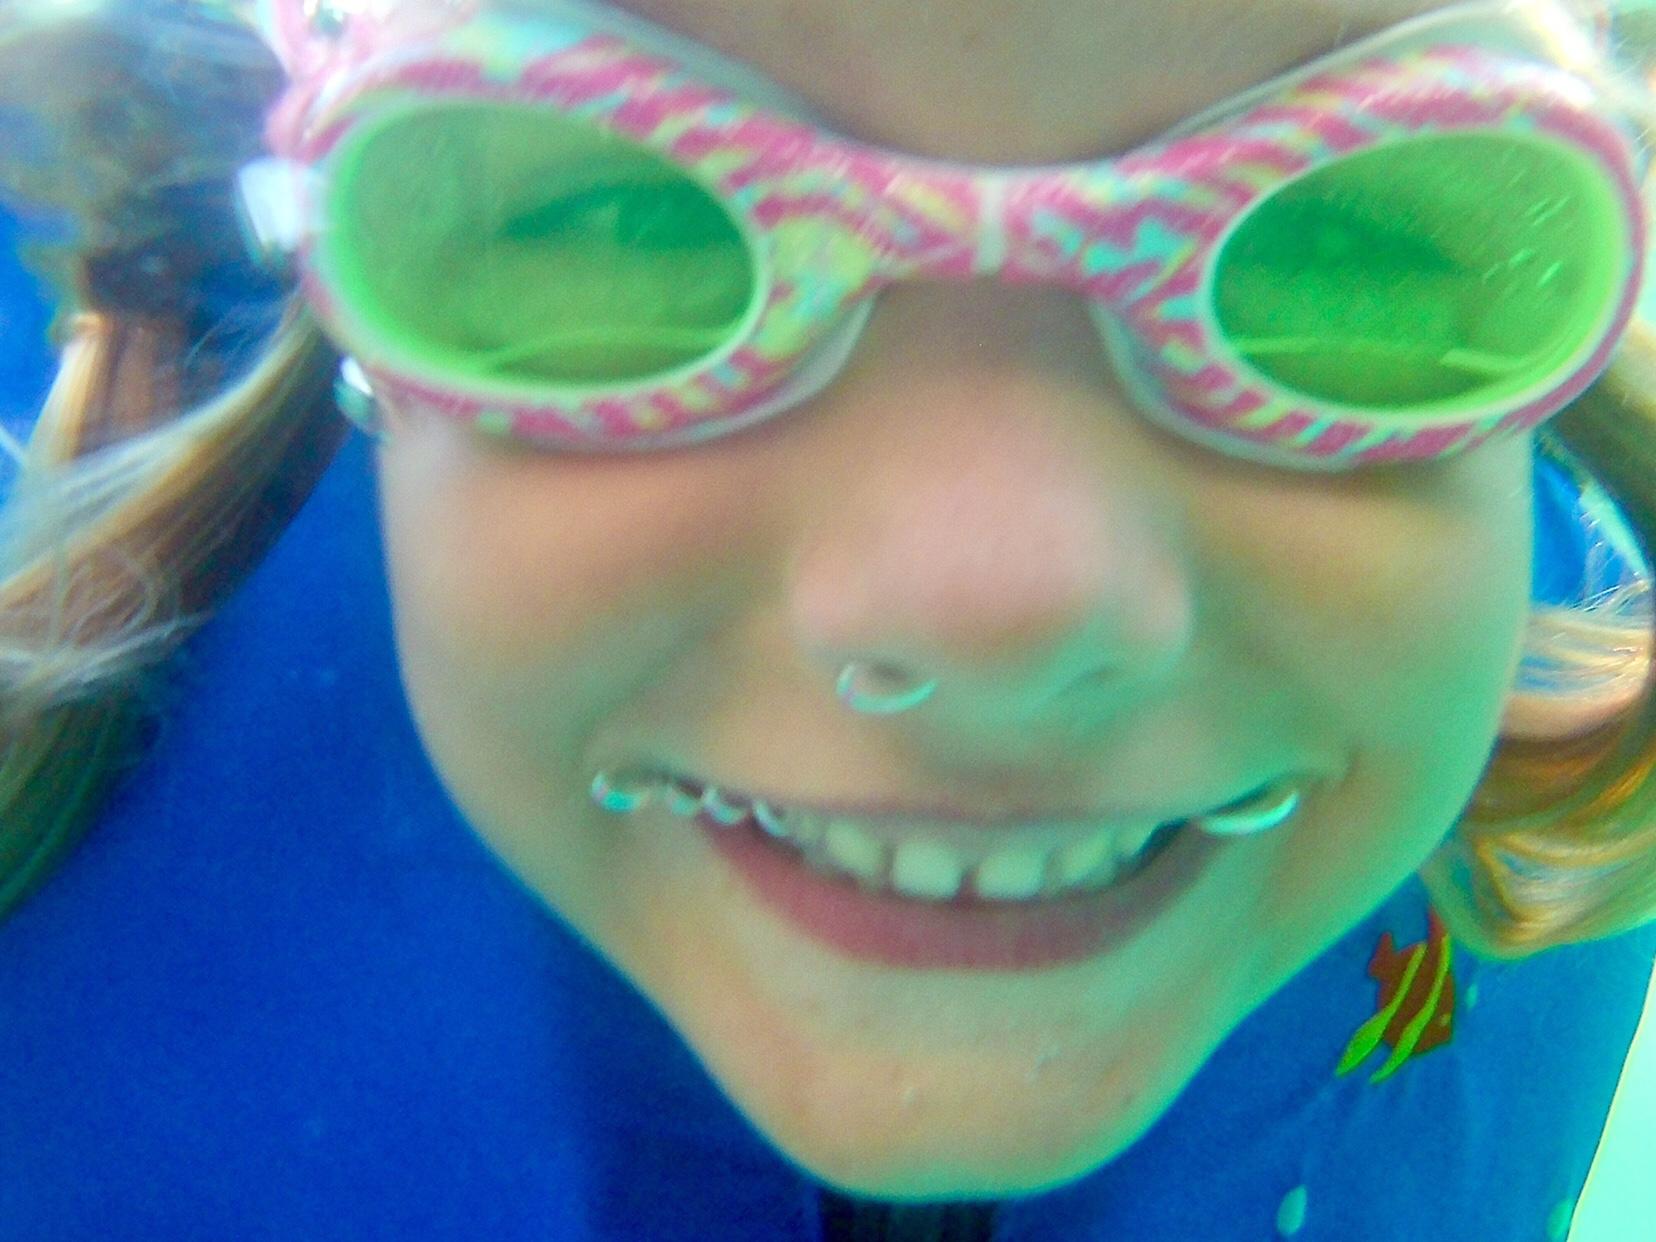 Nora underwater